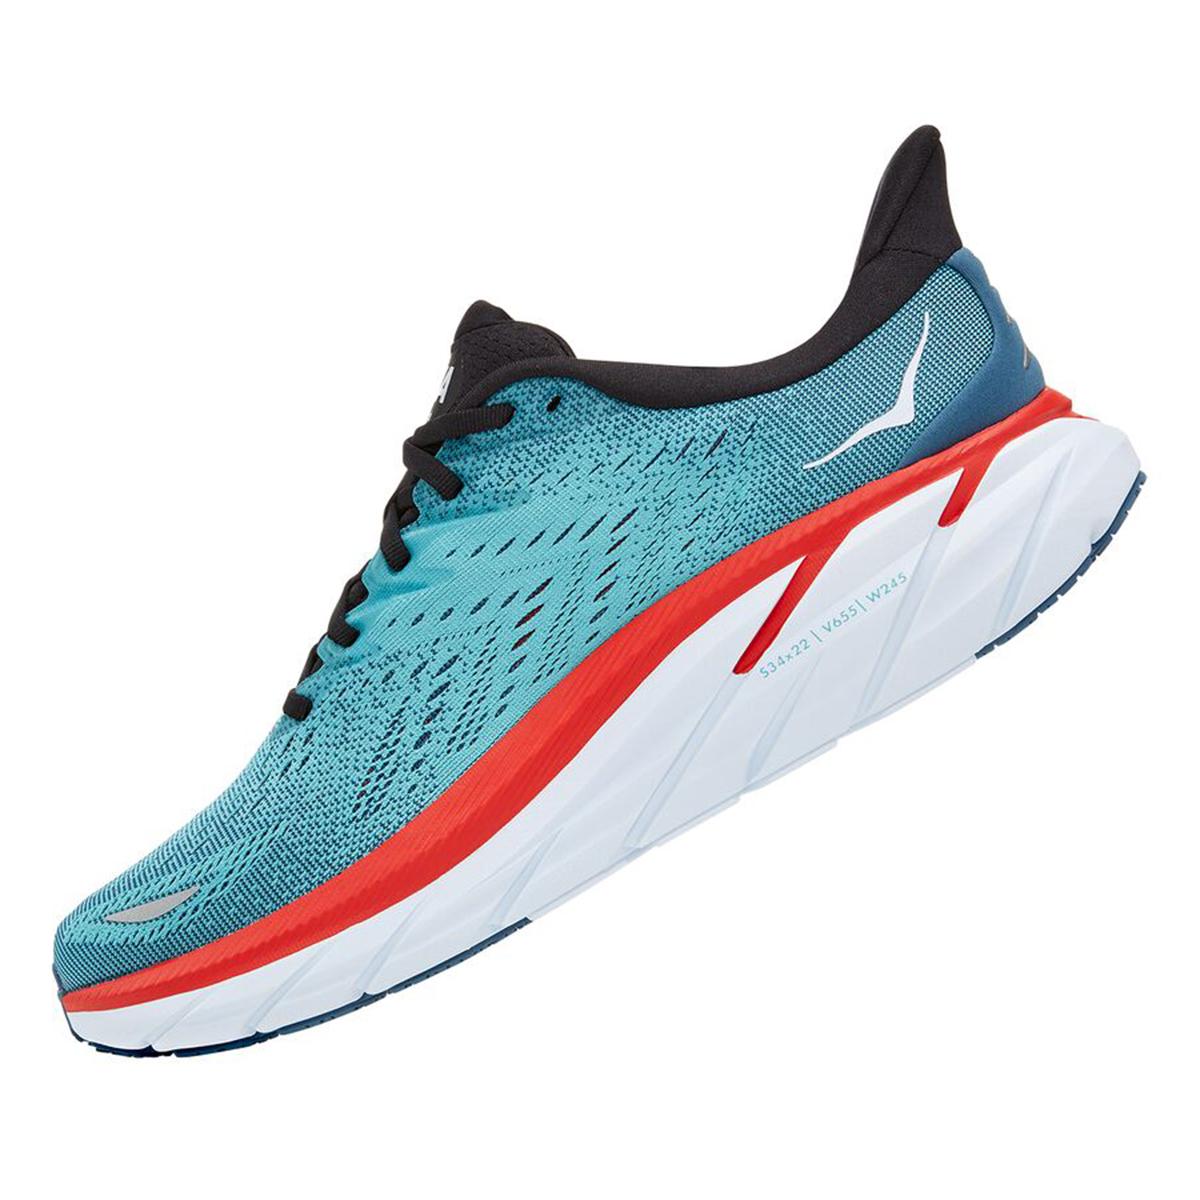 Men's Hoka One One Clifton 8 Running Shoe - Color: Real Teal/Aquarelle - Size: 7 - Width: Regular, Real Teal/Aquarelle, large, image 2